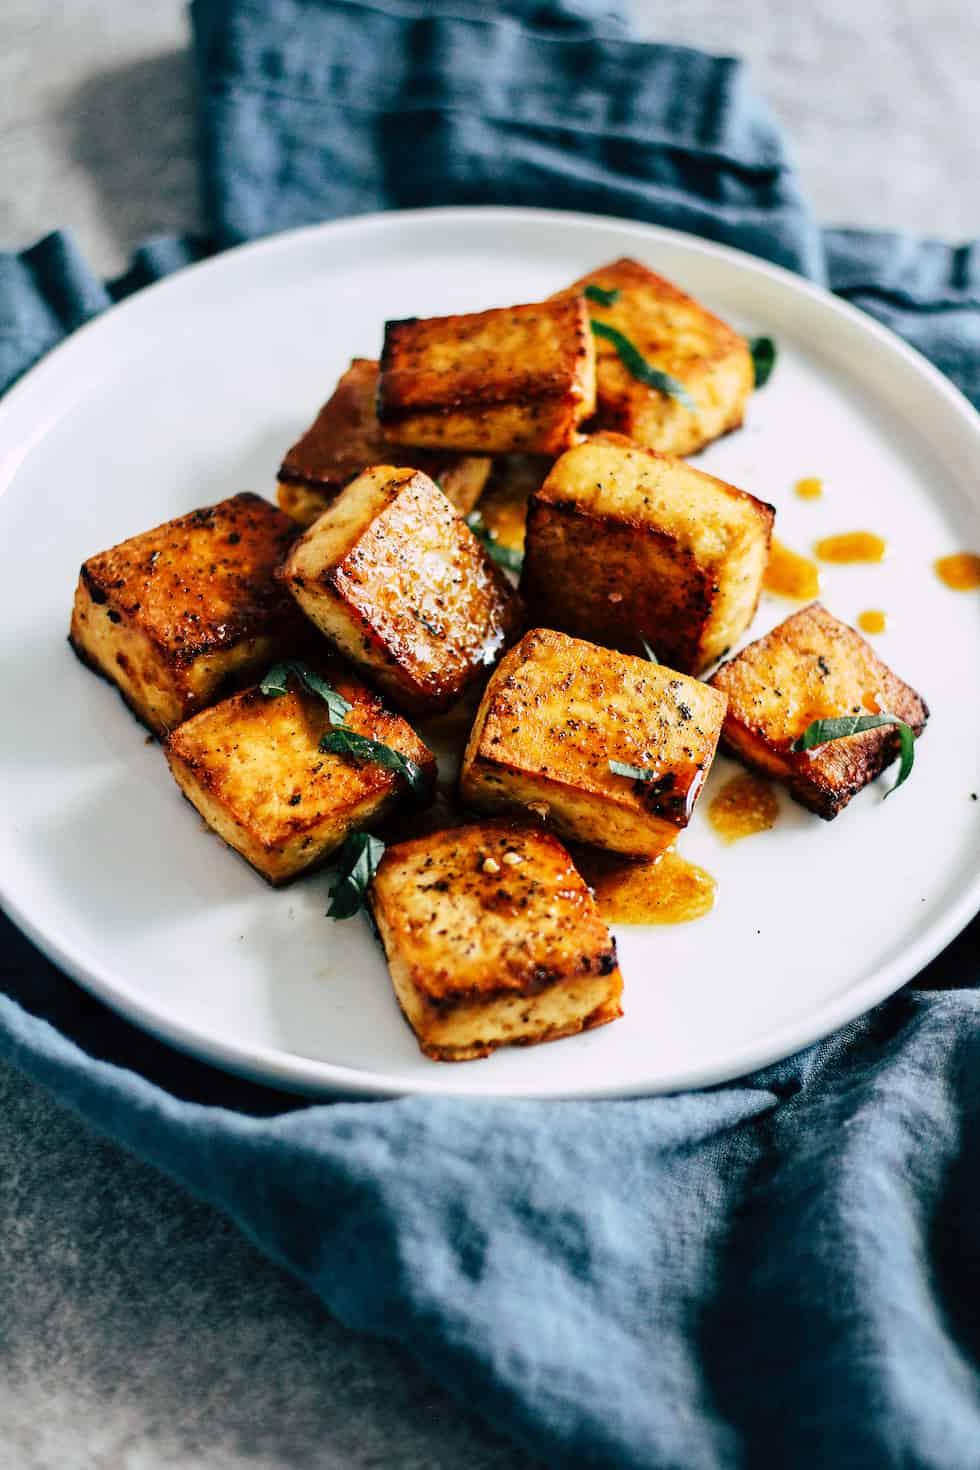 Crispy tofu on white plate with blue linen napkin.